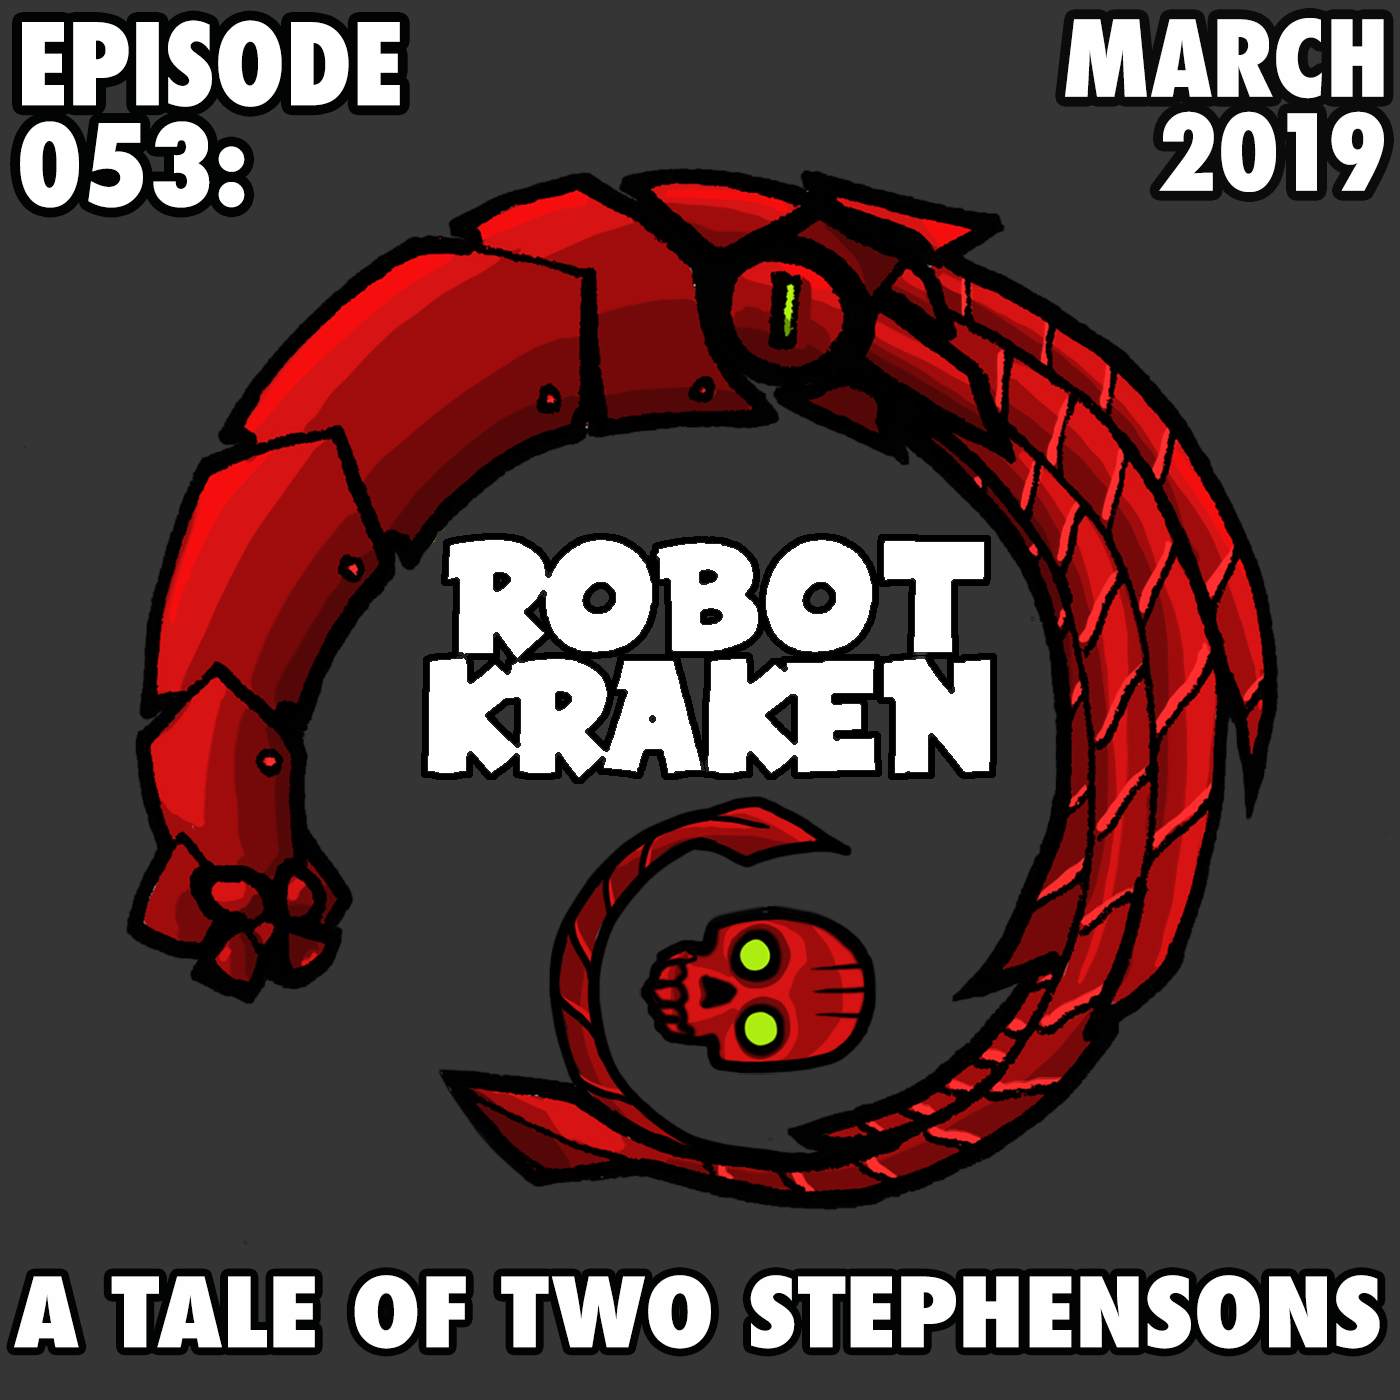 Robot-Kraken-053-Cover.png